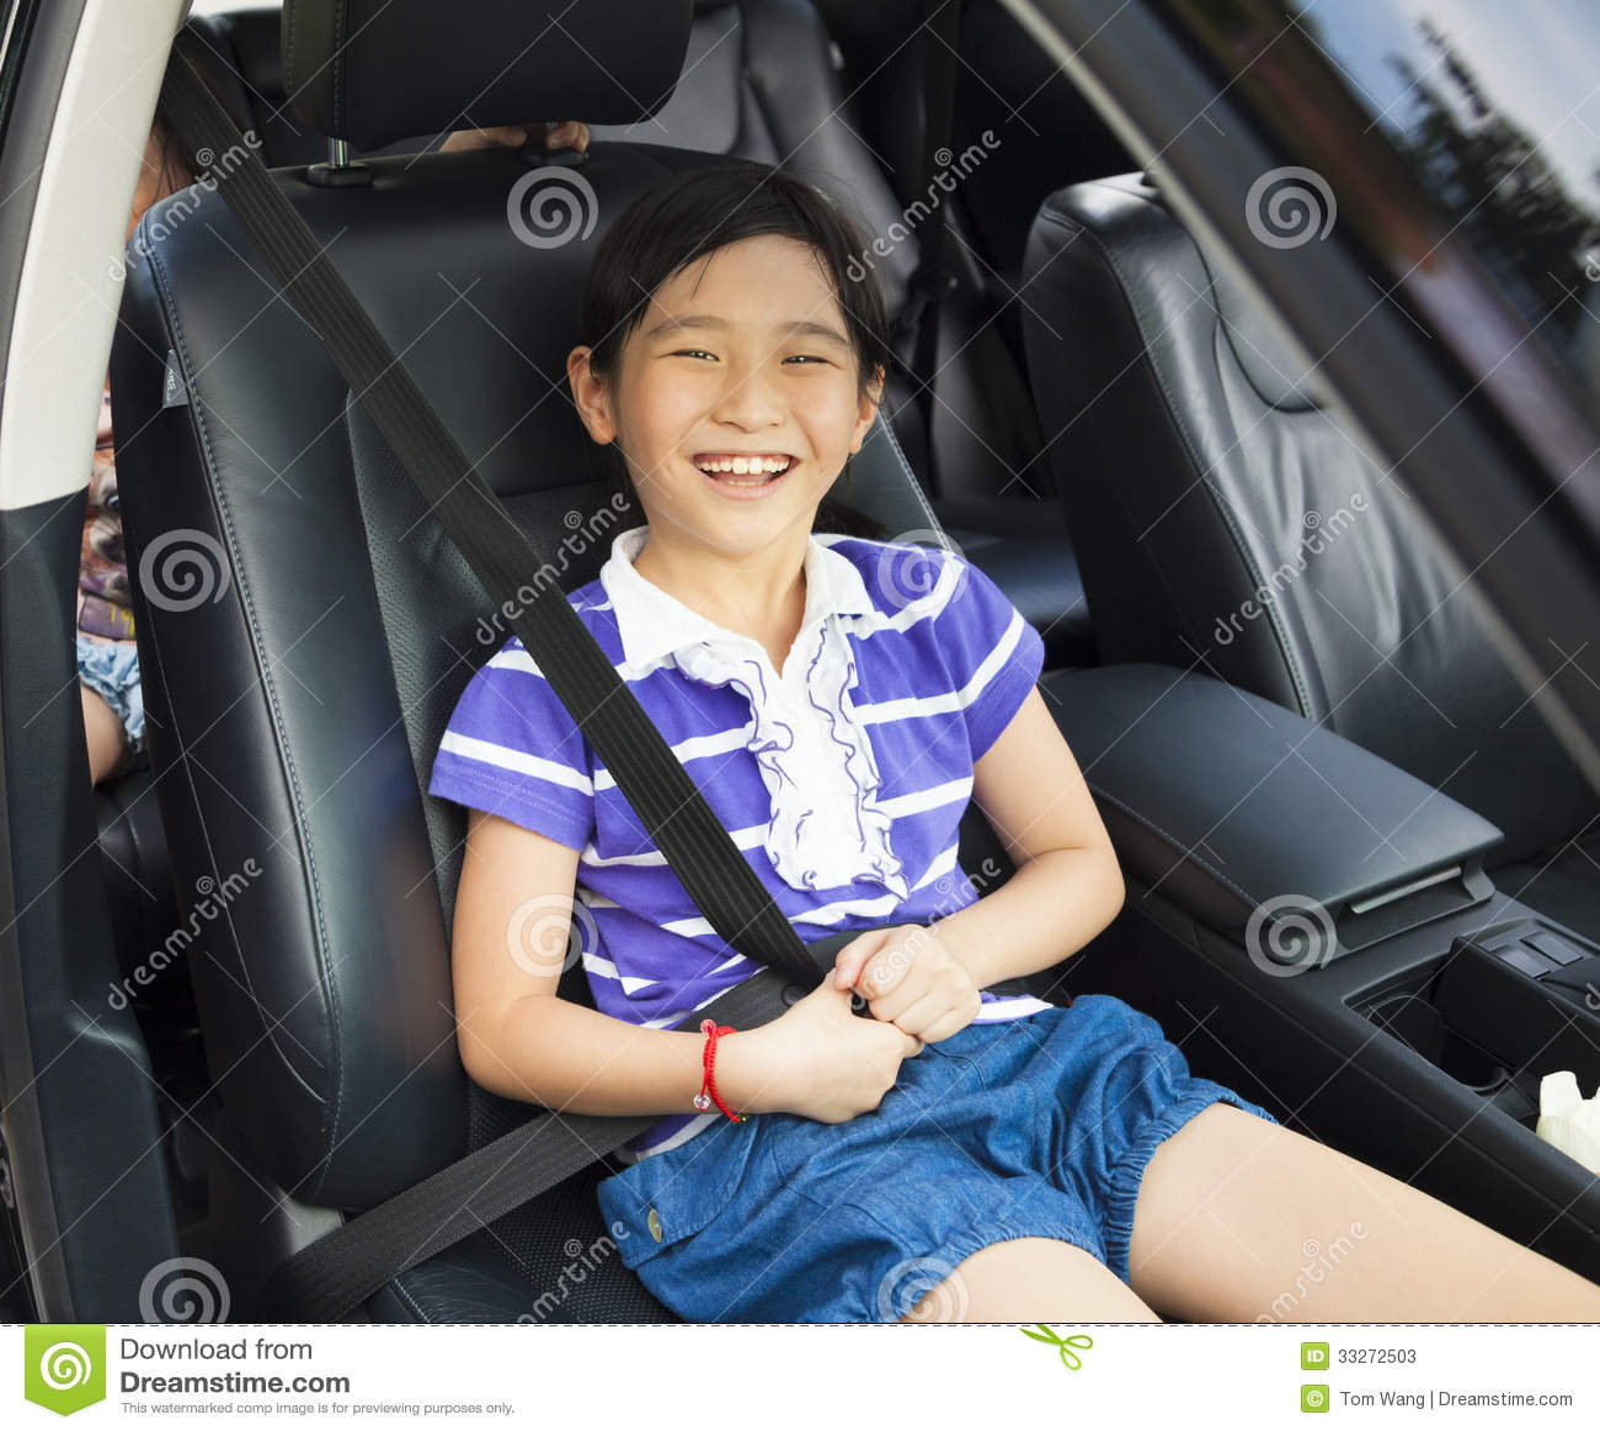 Bikini Girl Driving Naked Seatbelt Images